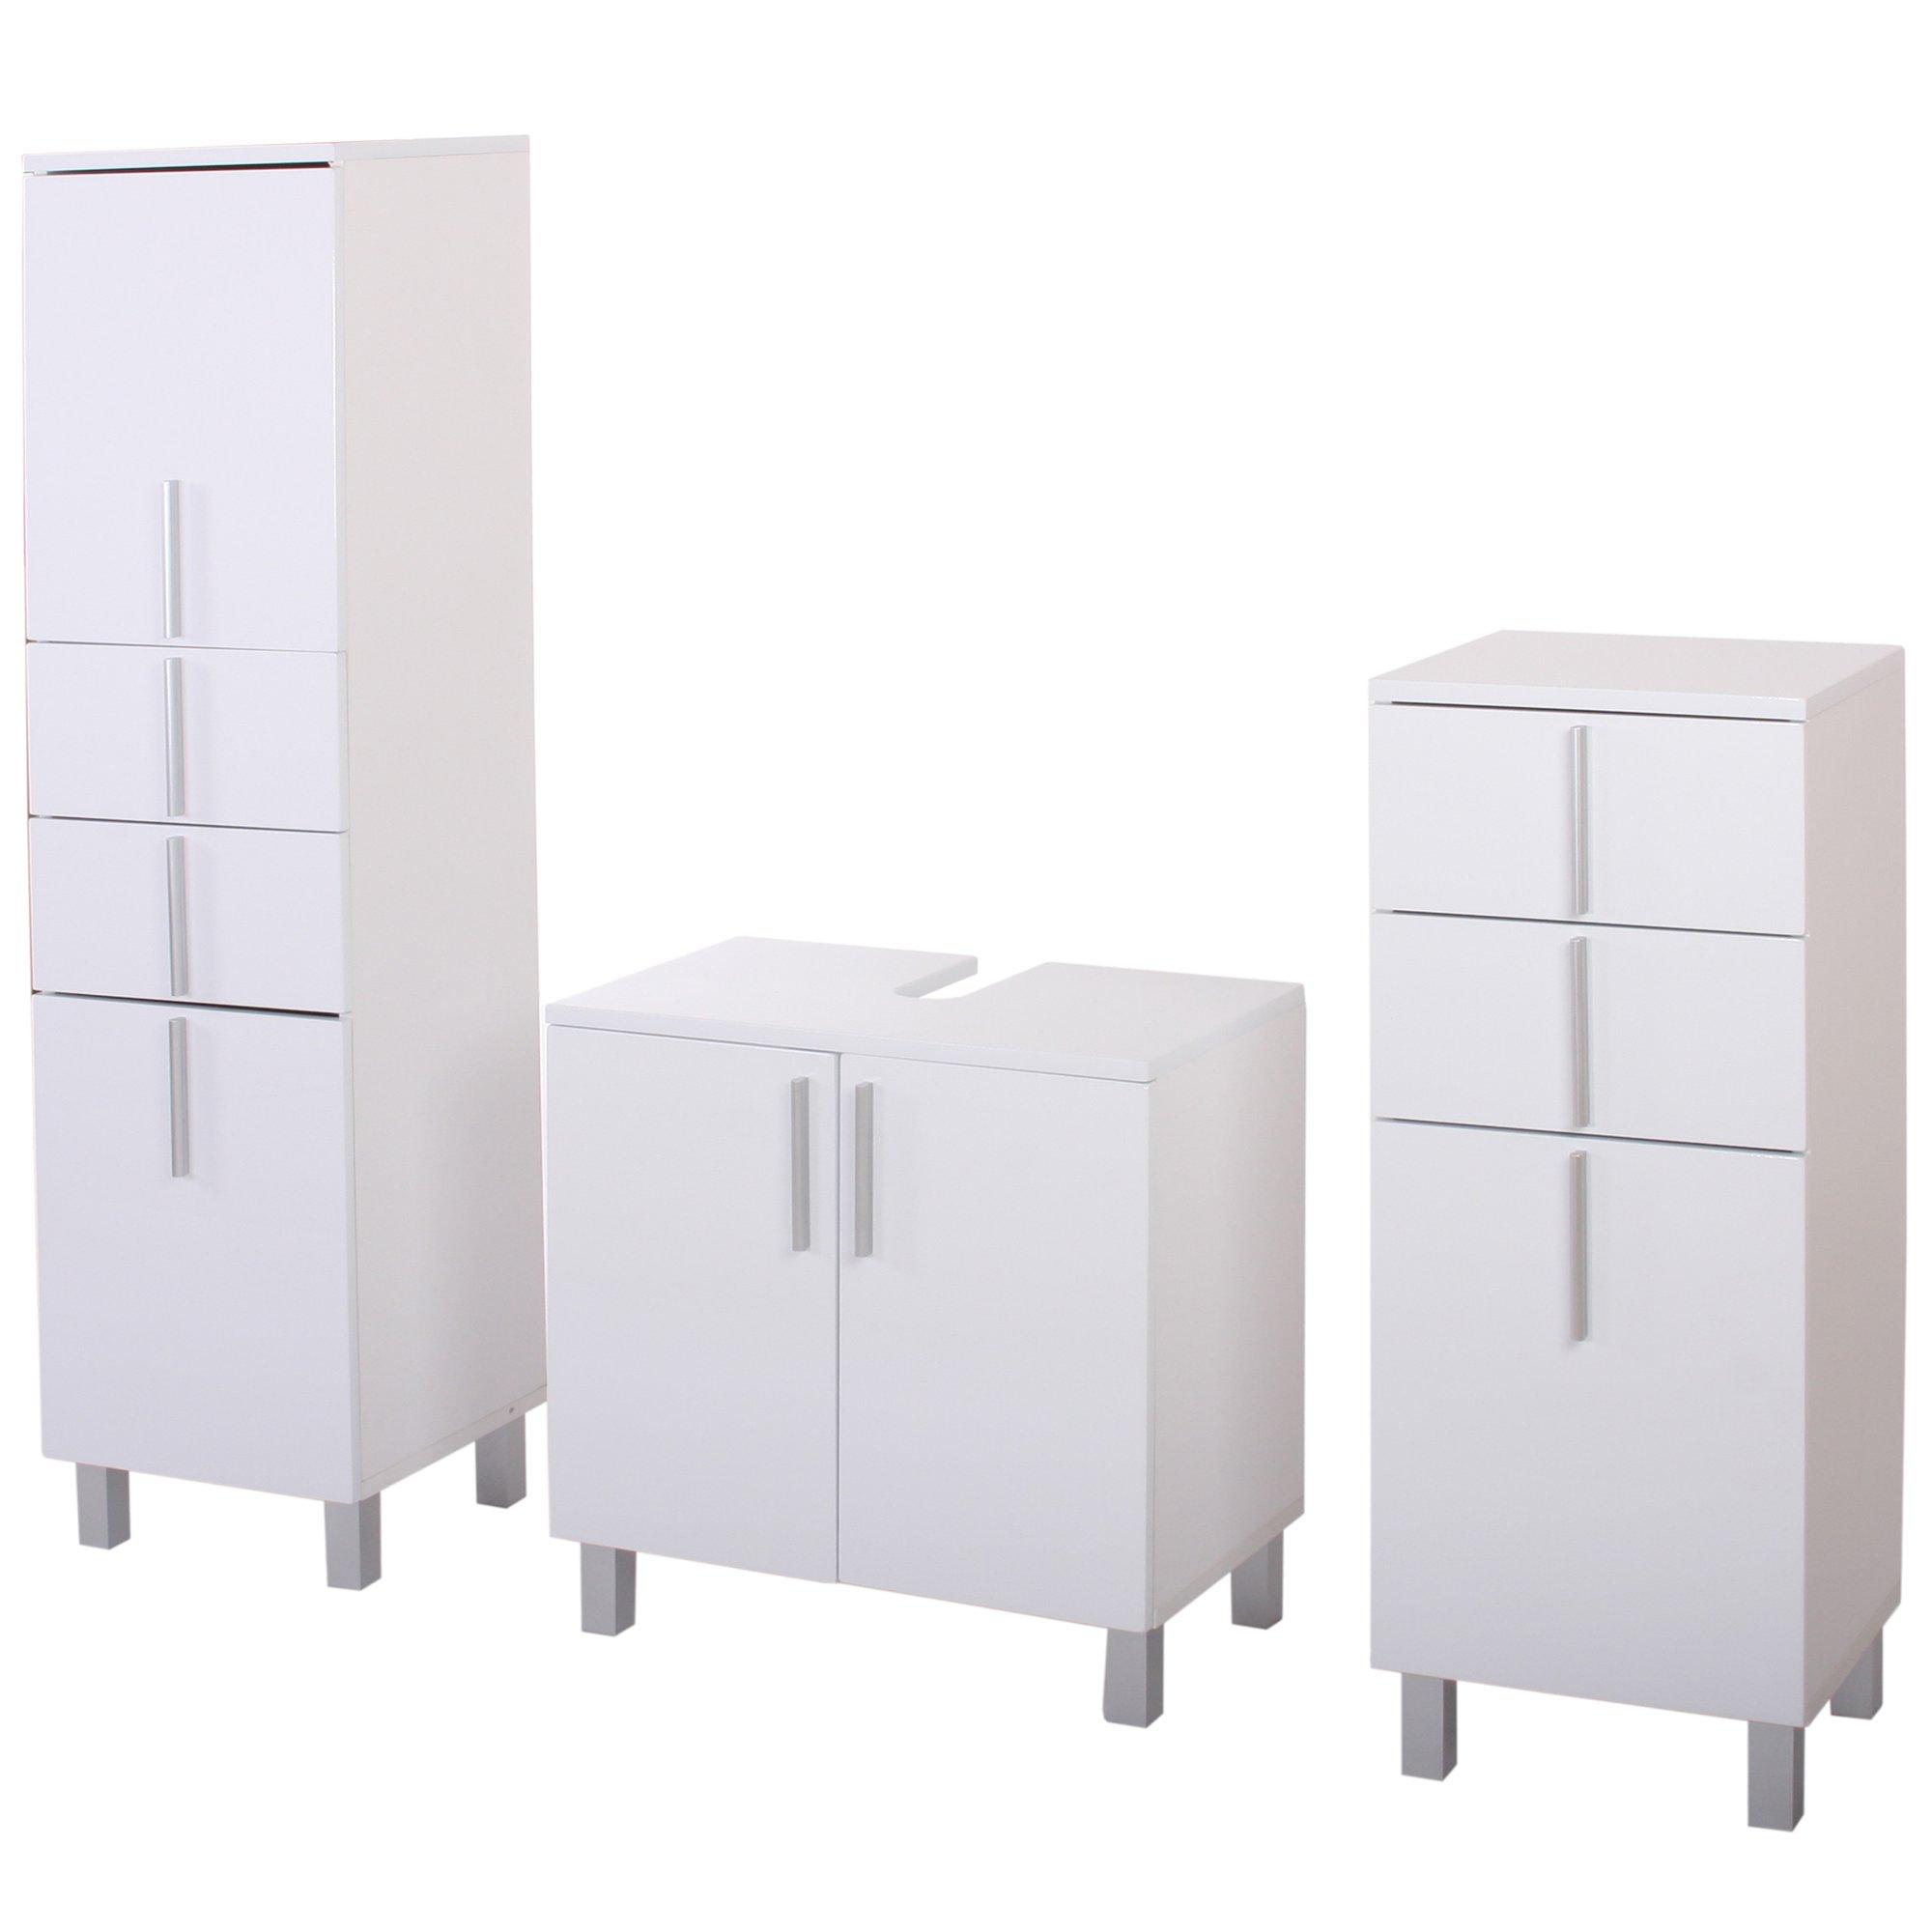 Conjunto de 3 muebles para ba o nordik 2 armarios altos - Armarios de bano altos ...